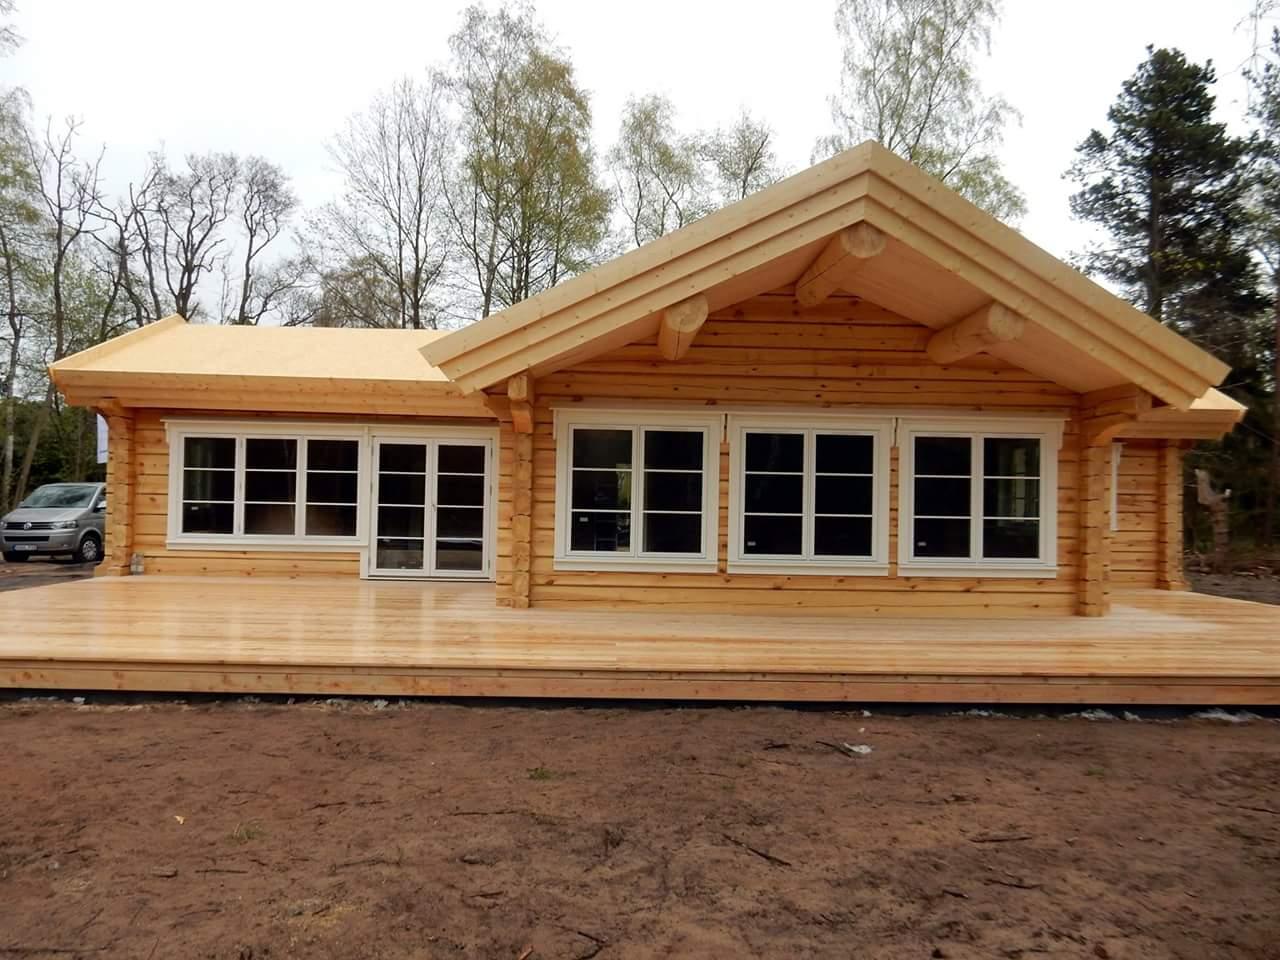 Casas de madera natural - Casas de madera natural ...